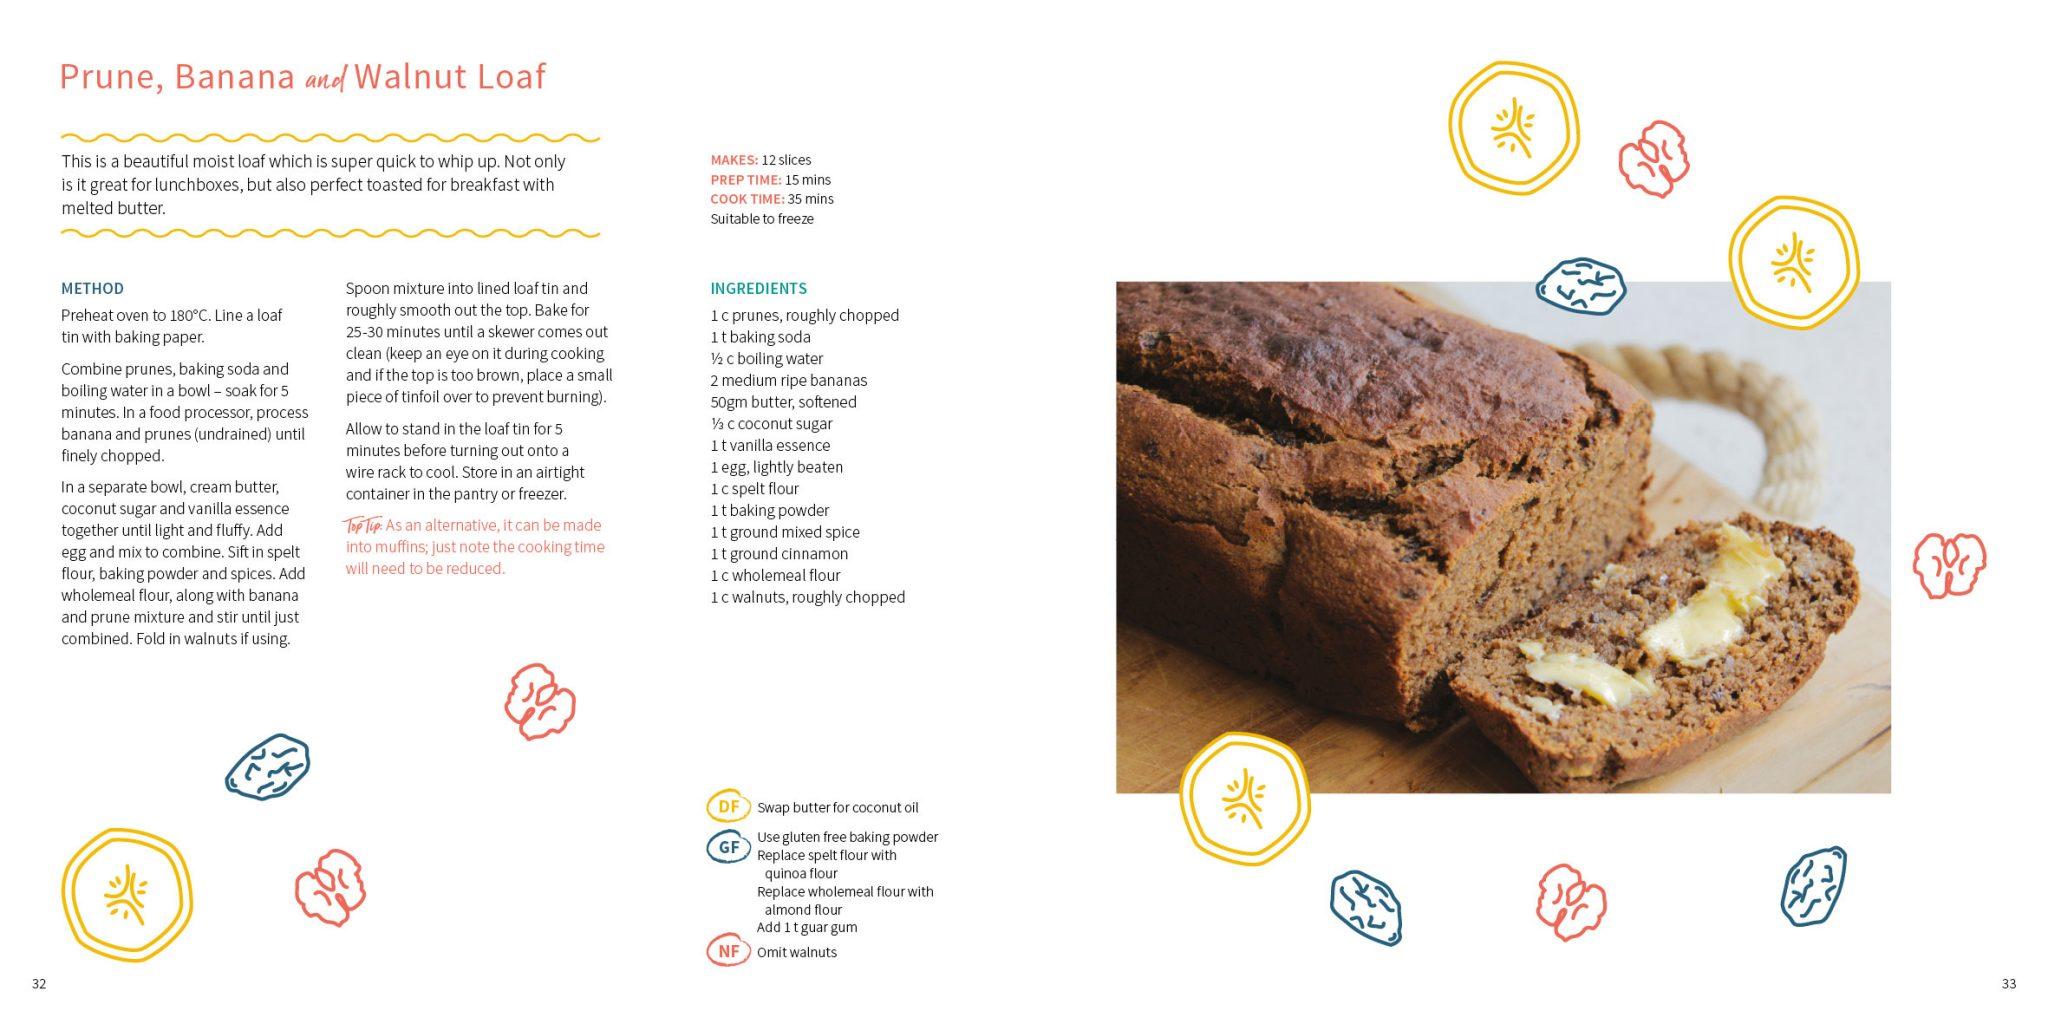 Prune-and-Walnut-Loaf